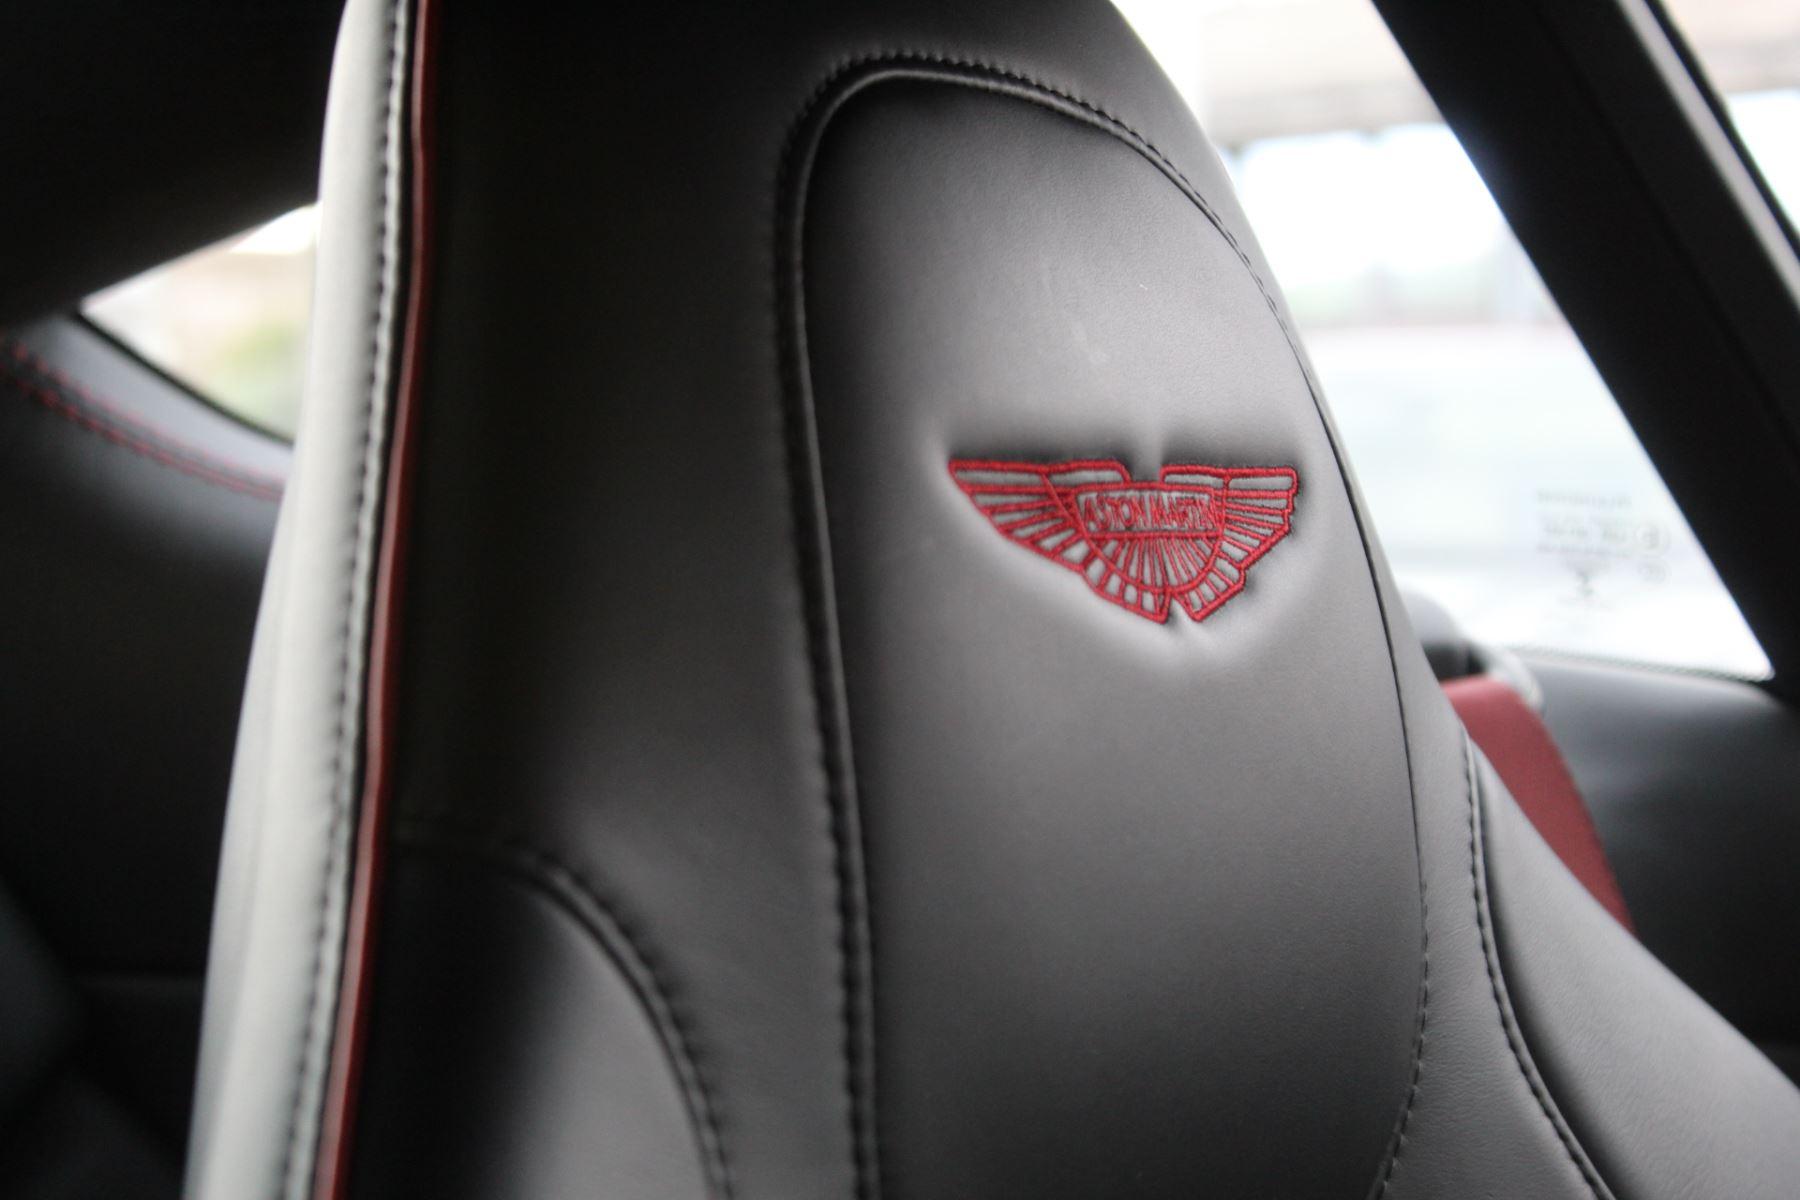 Aston Martin Vanquish V12 [568] 2+2 2dr Touchtronic  Carbon Black Edition  image 9